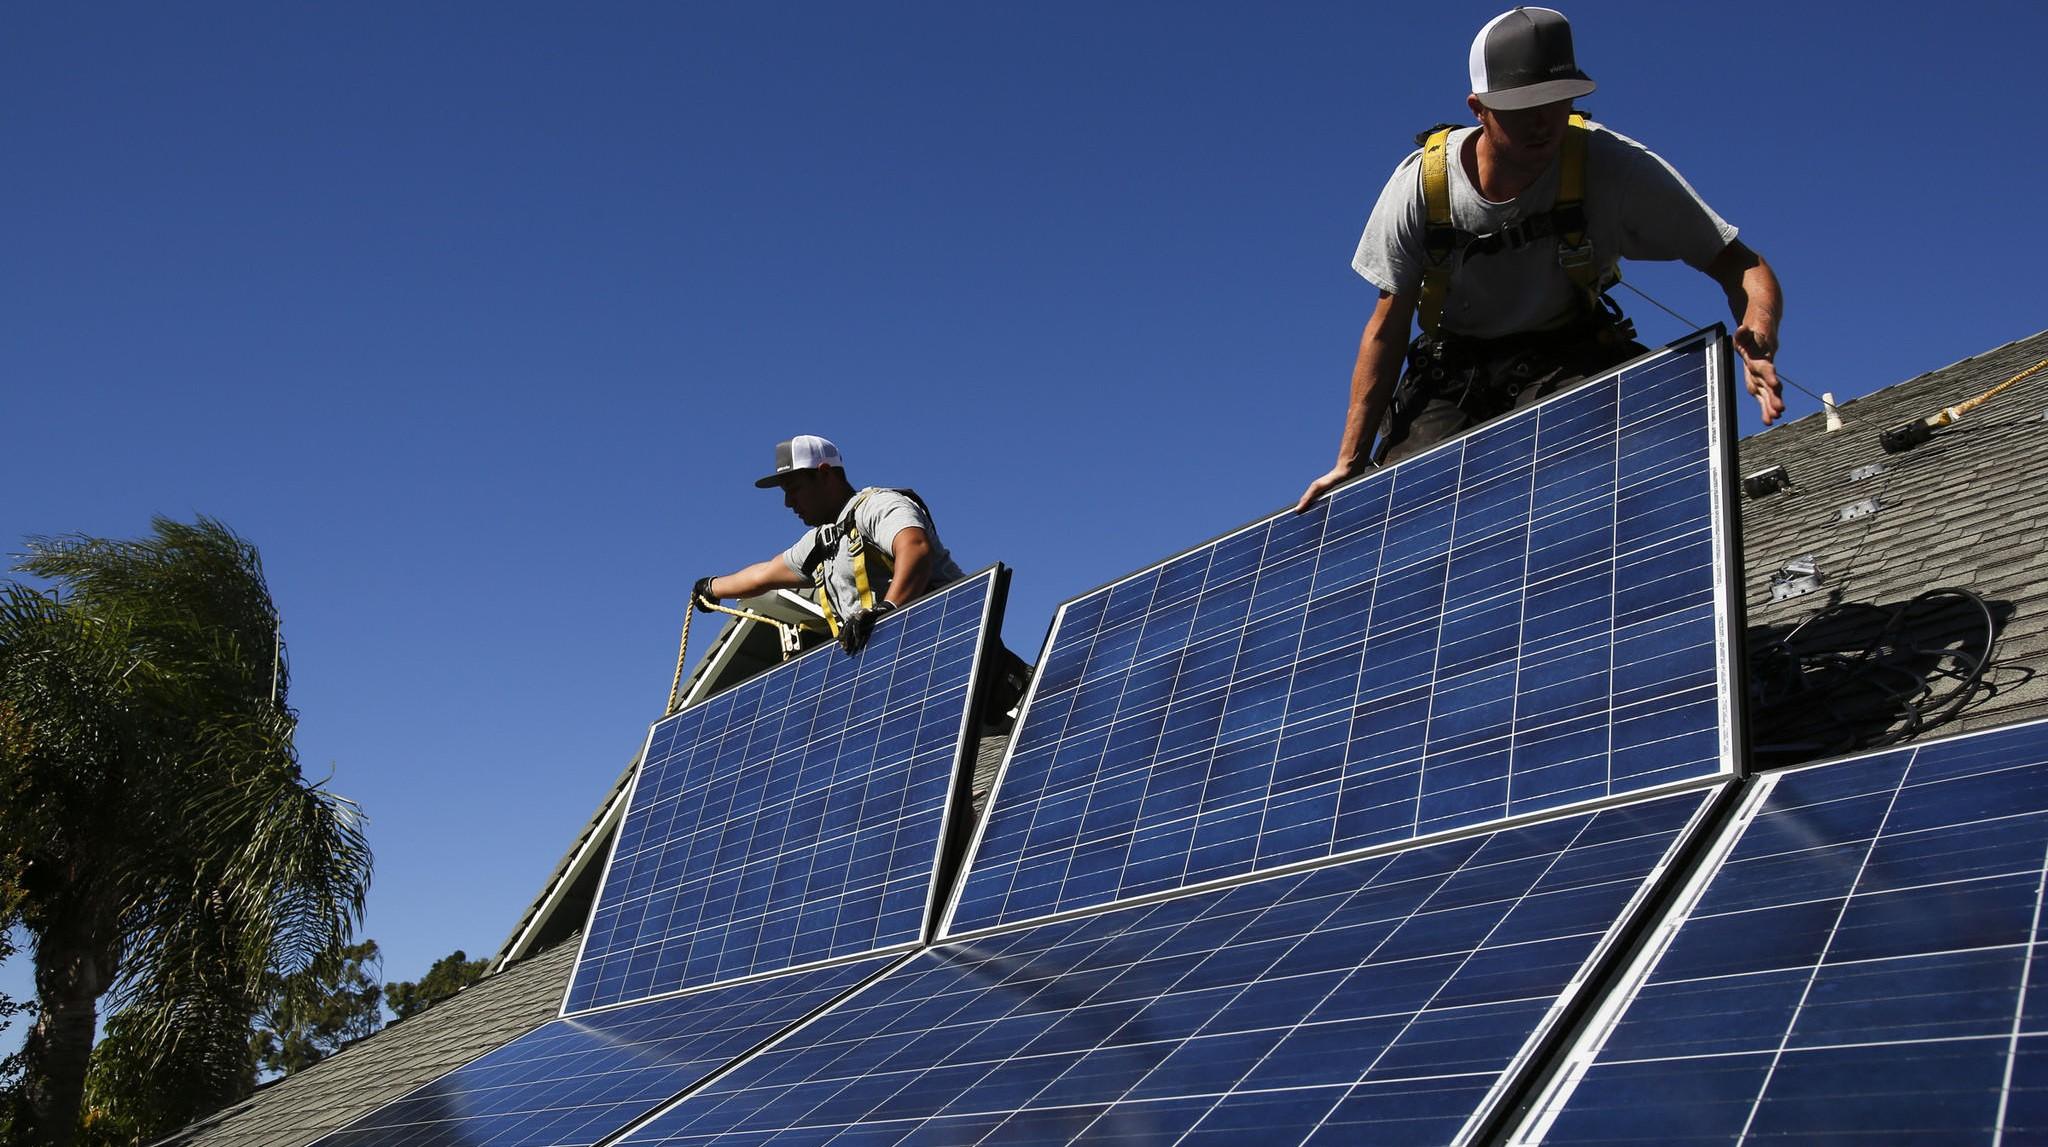 Solar installation in LADWP territory